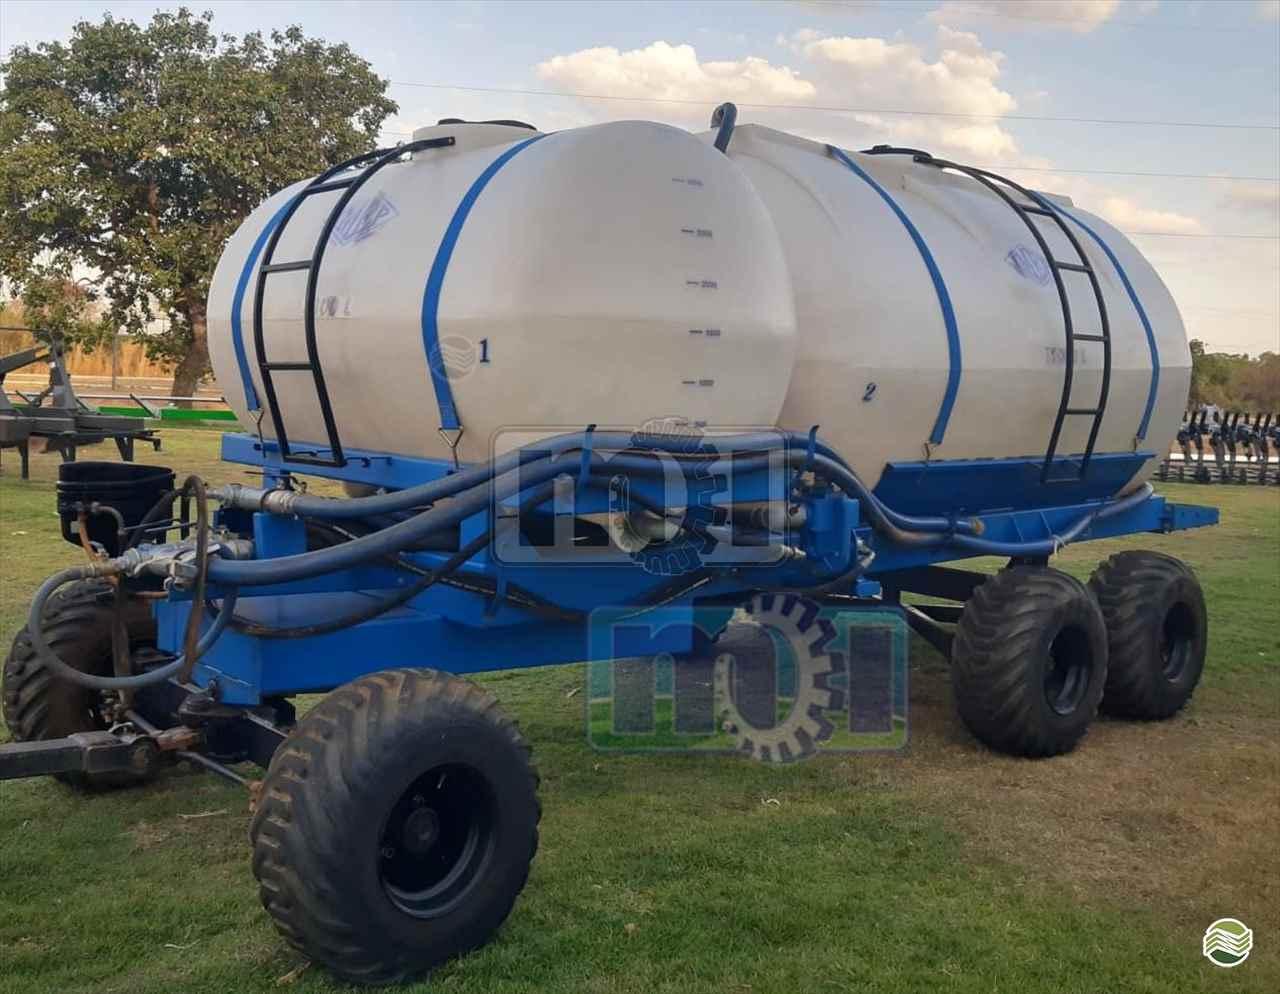 IMPLEMENTOS AGRICOLAS CARRETA CALDA PRONTA CARRETA 10.000 L Moi Maquinas e Implementos Agricolas PORTO NACIONAL TOCANTINS TO